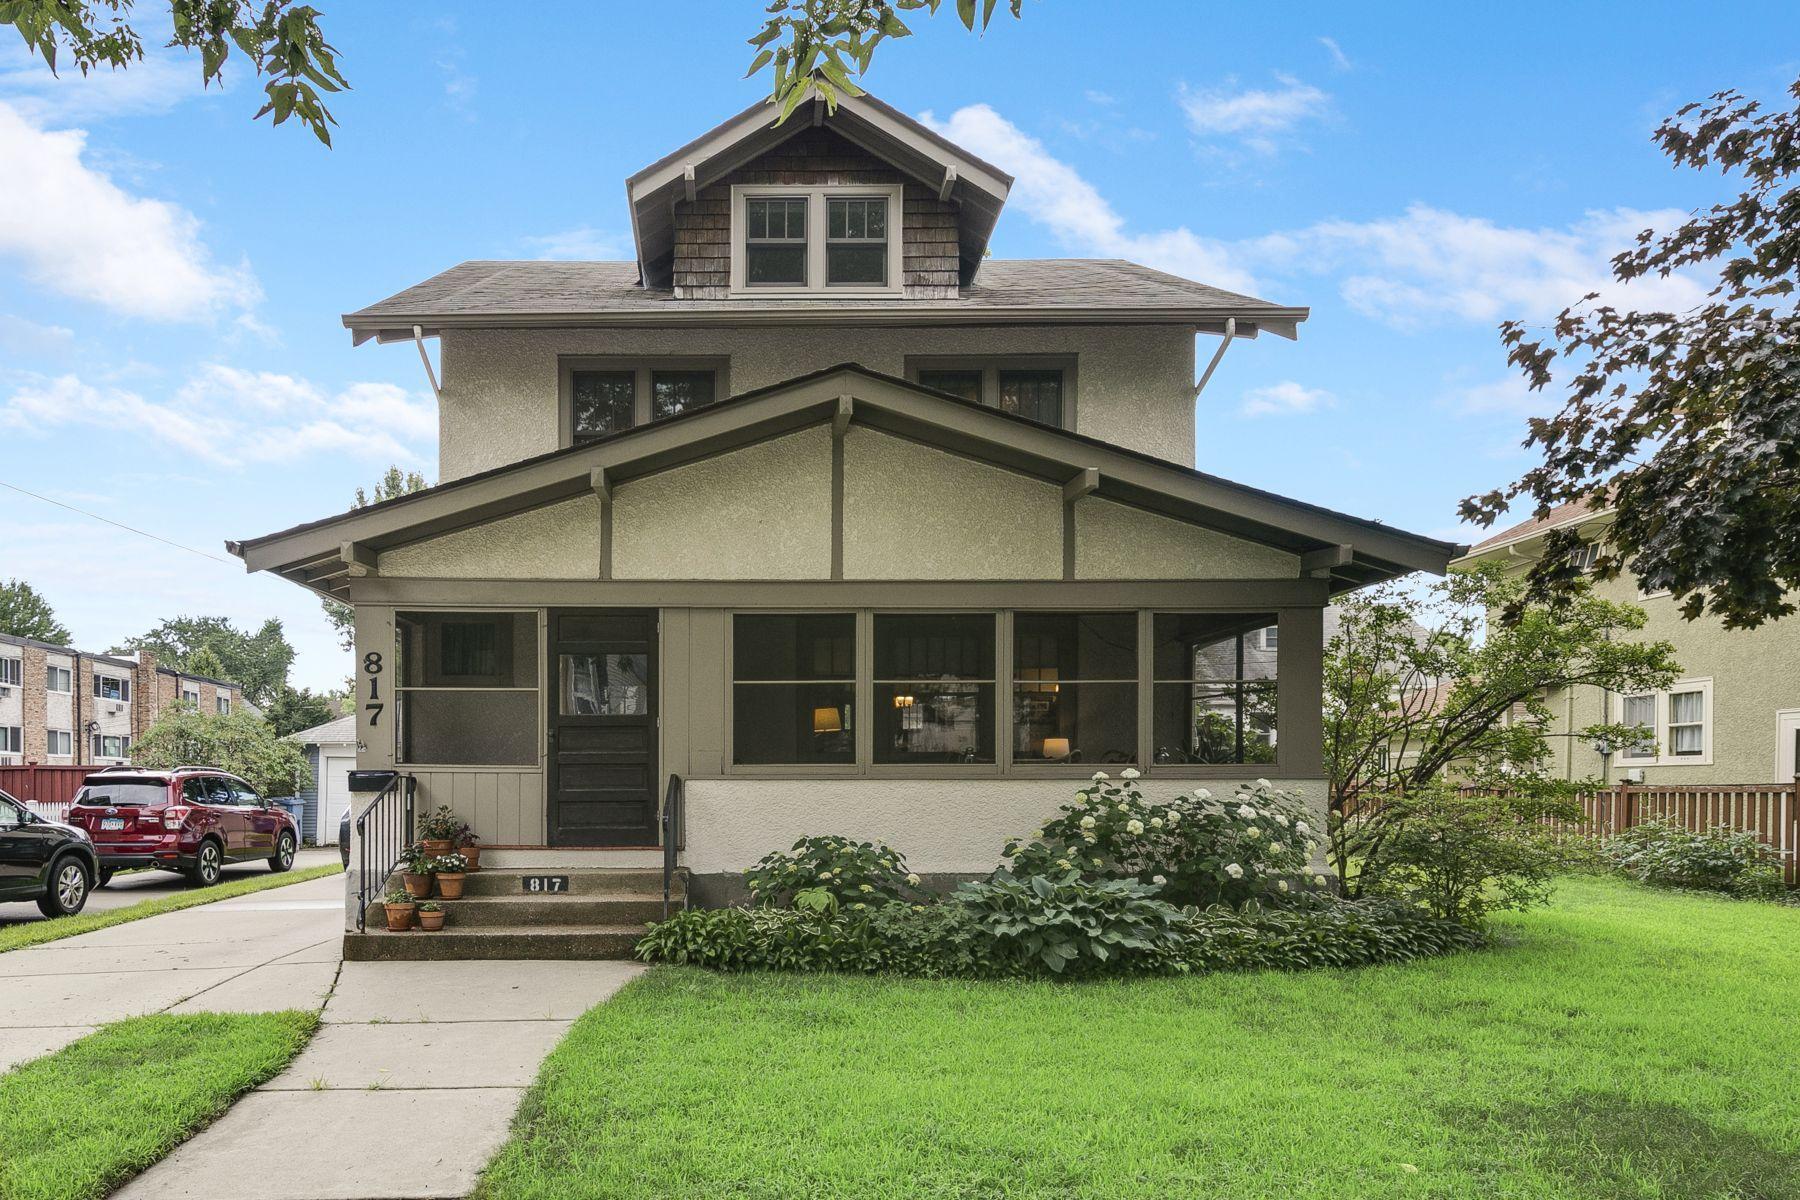 817 39th Property Photo - Minneapolis, MN real estate listing